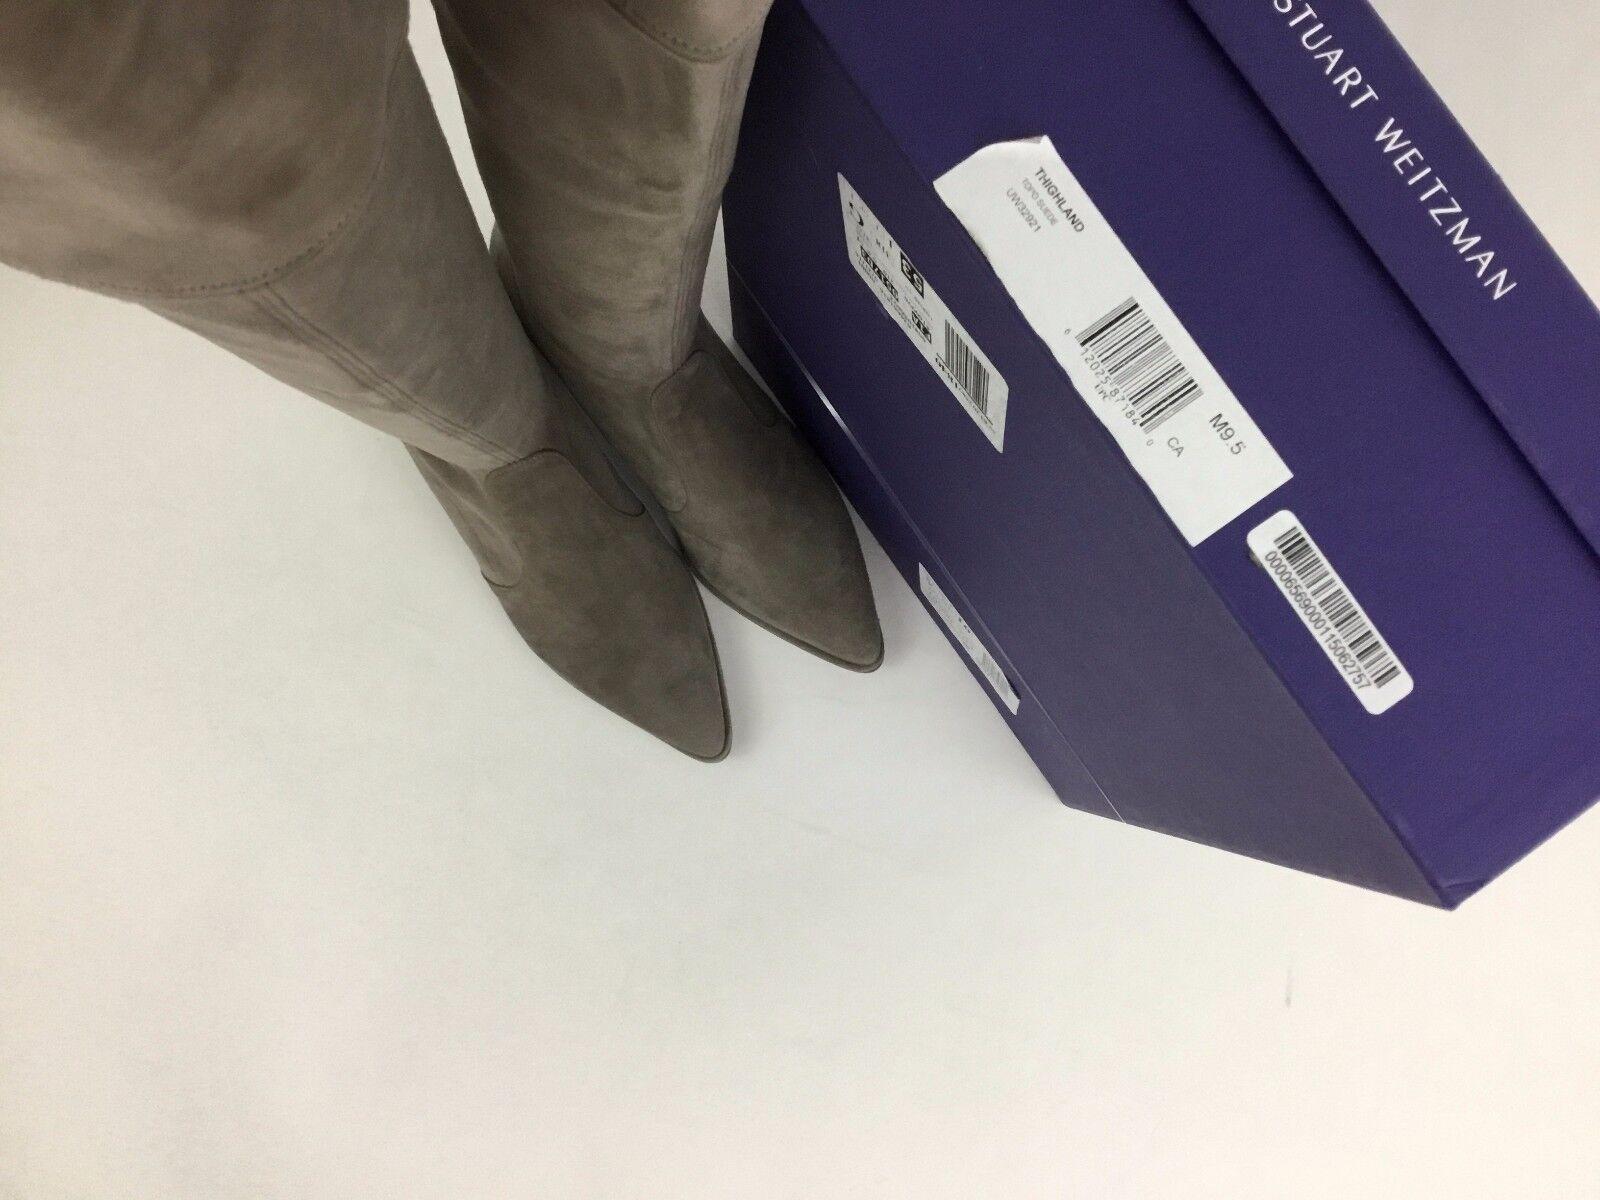 Stuart Weitzman Weitzman Weitzman Thighland Over The Knee Topo Suede Boots Thigh High Booties 9.5 5b2ab6